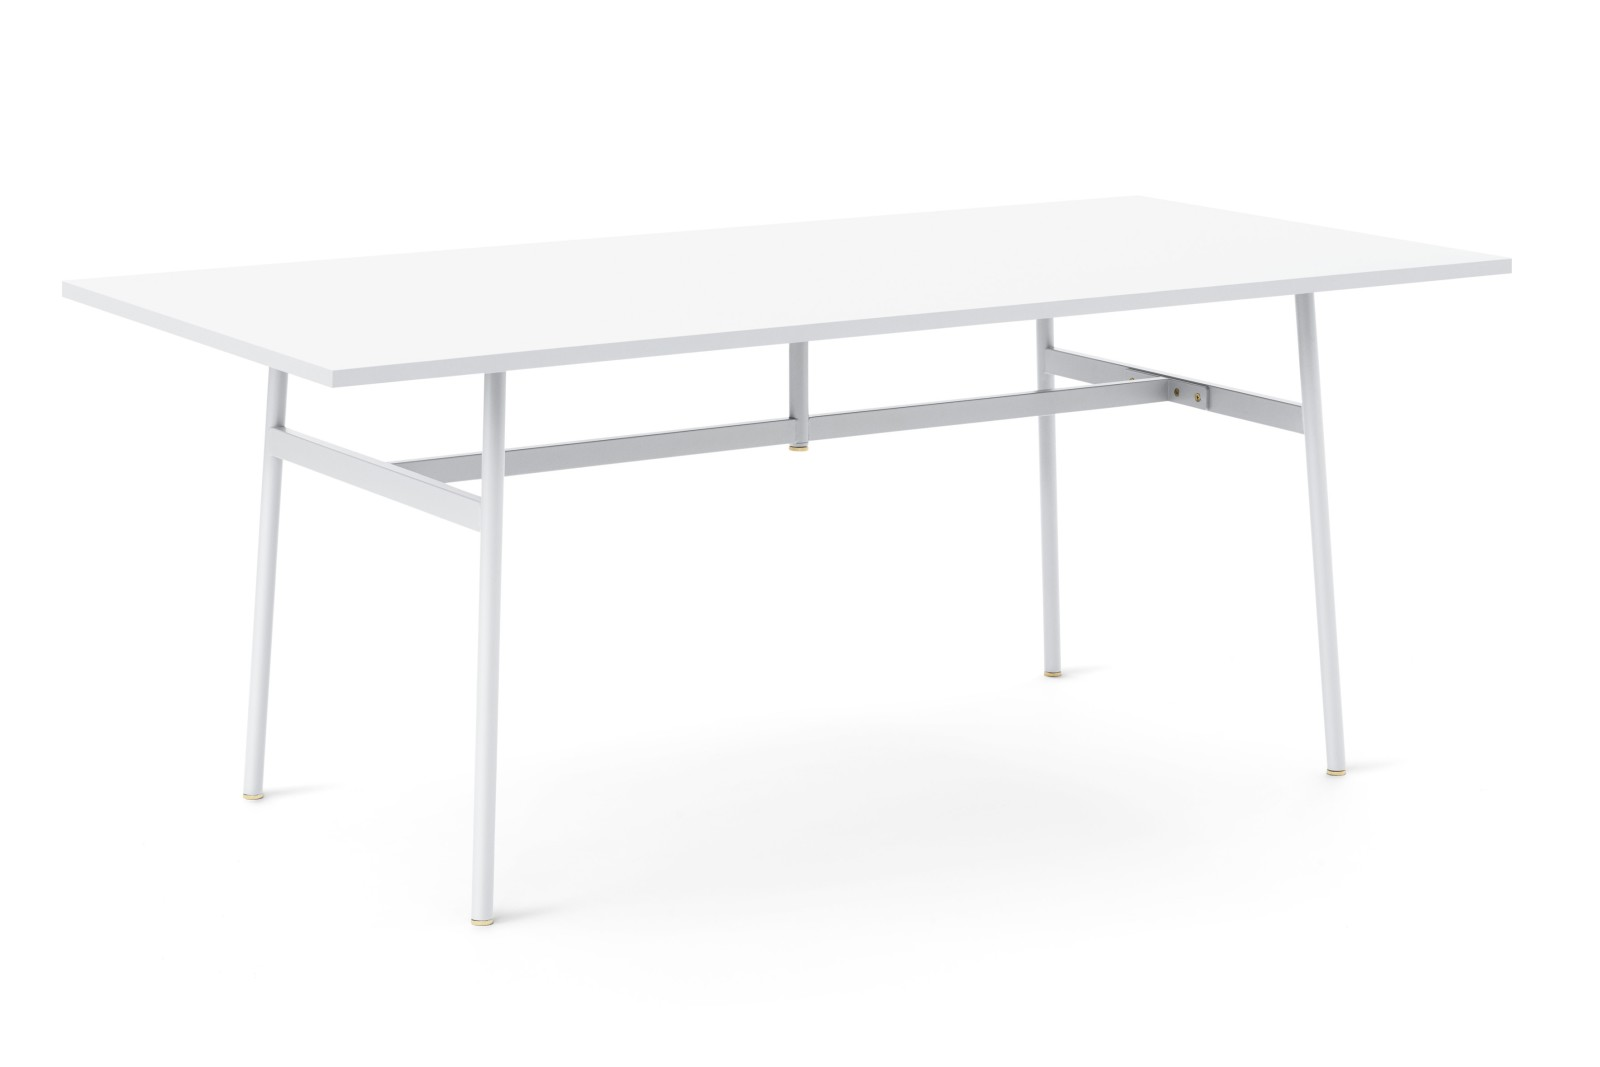 Union Rectangular Dining Table White, 180